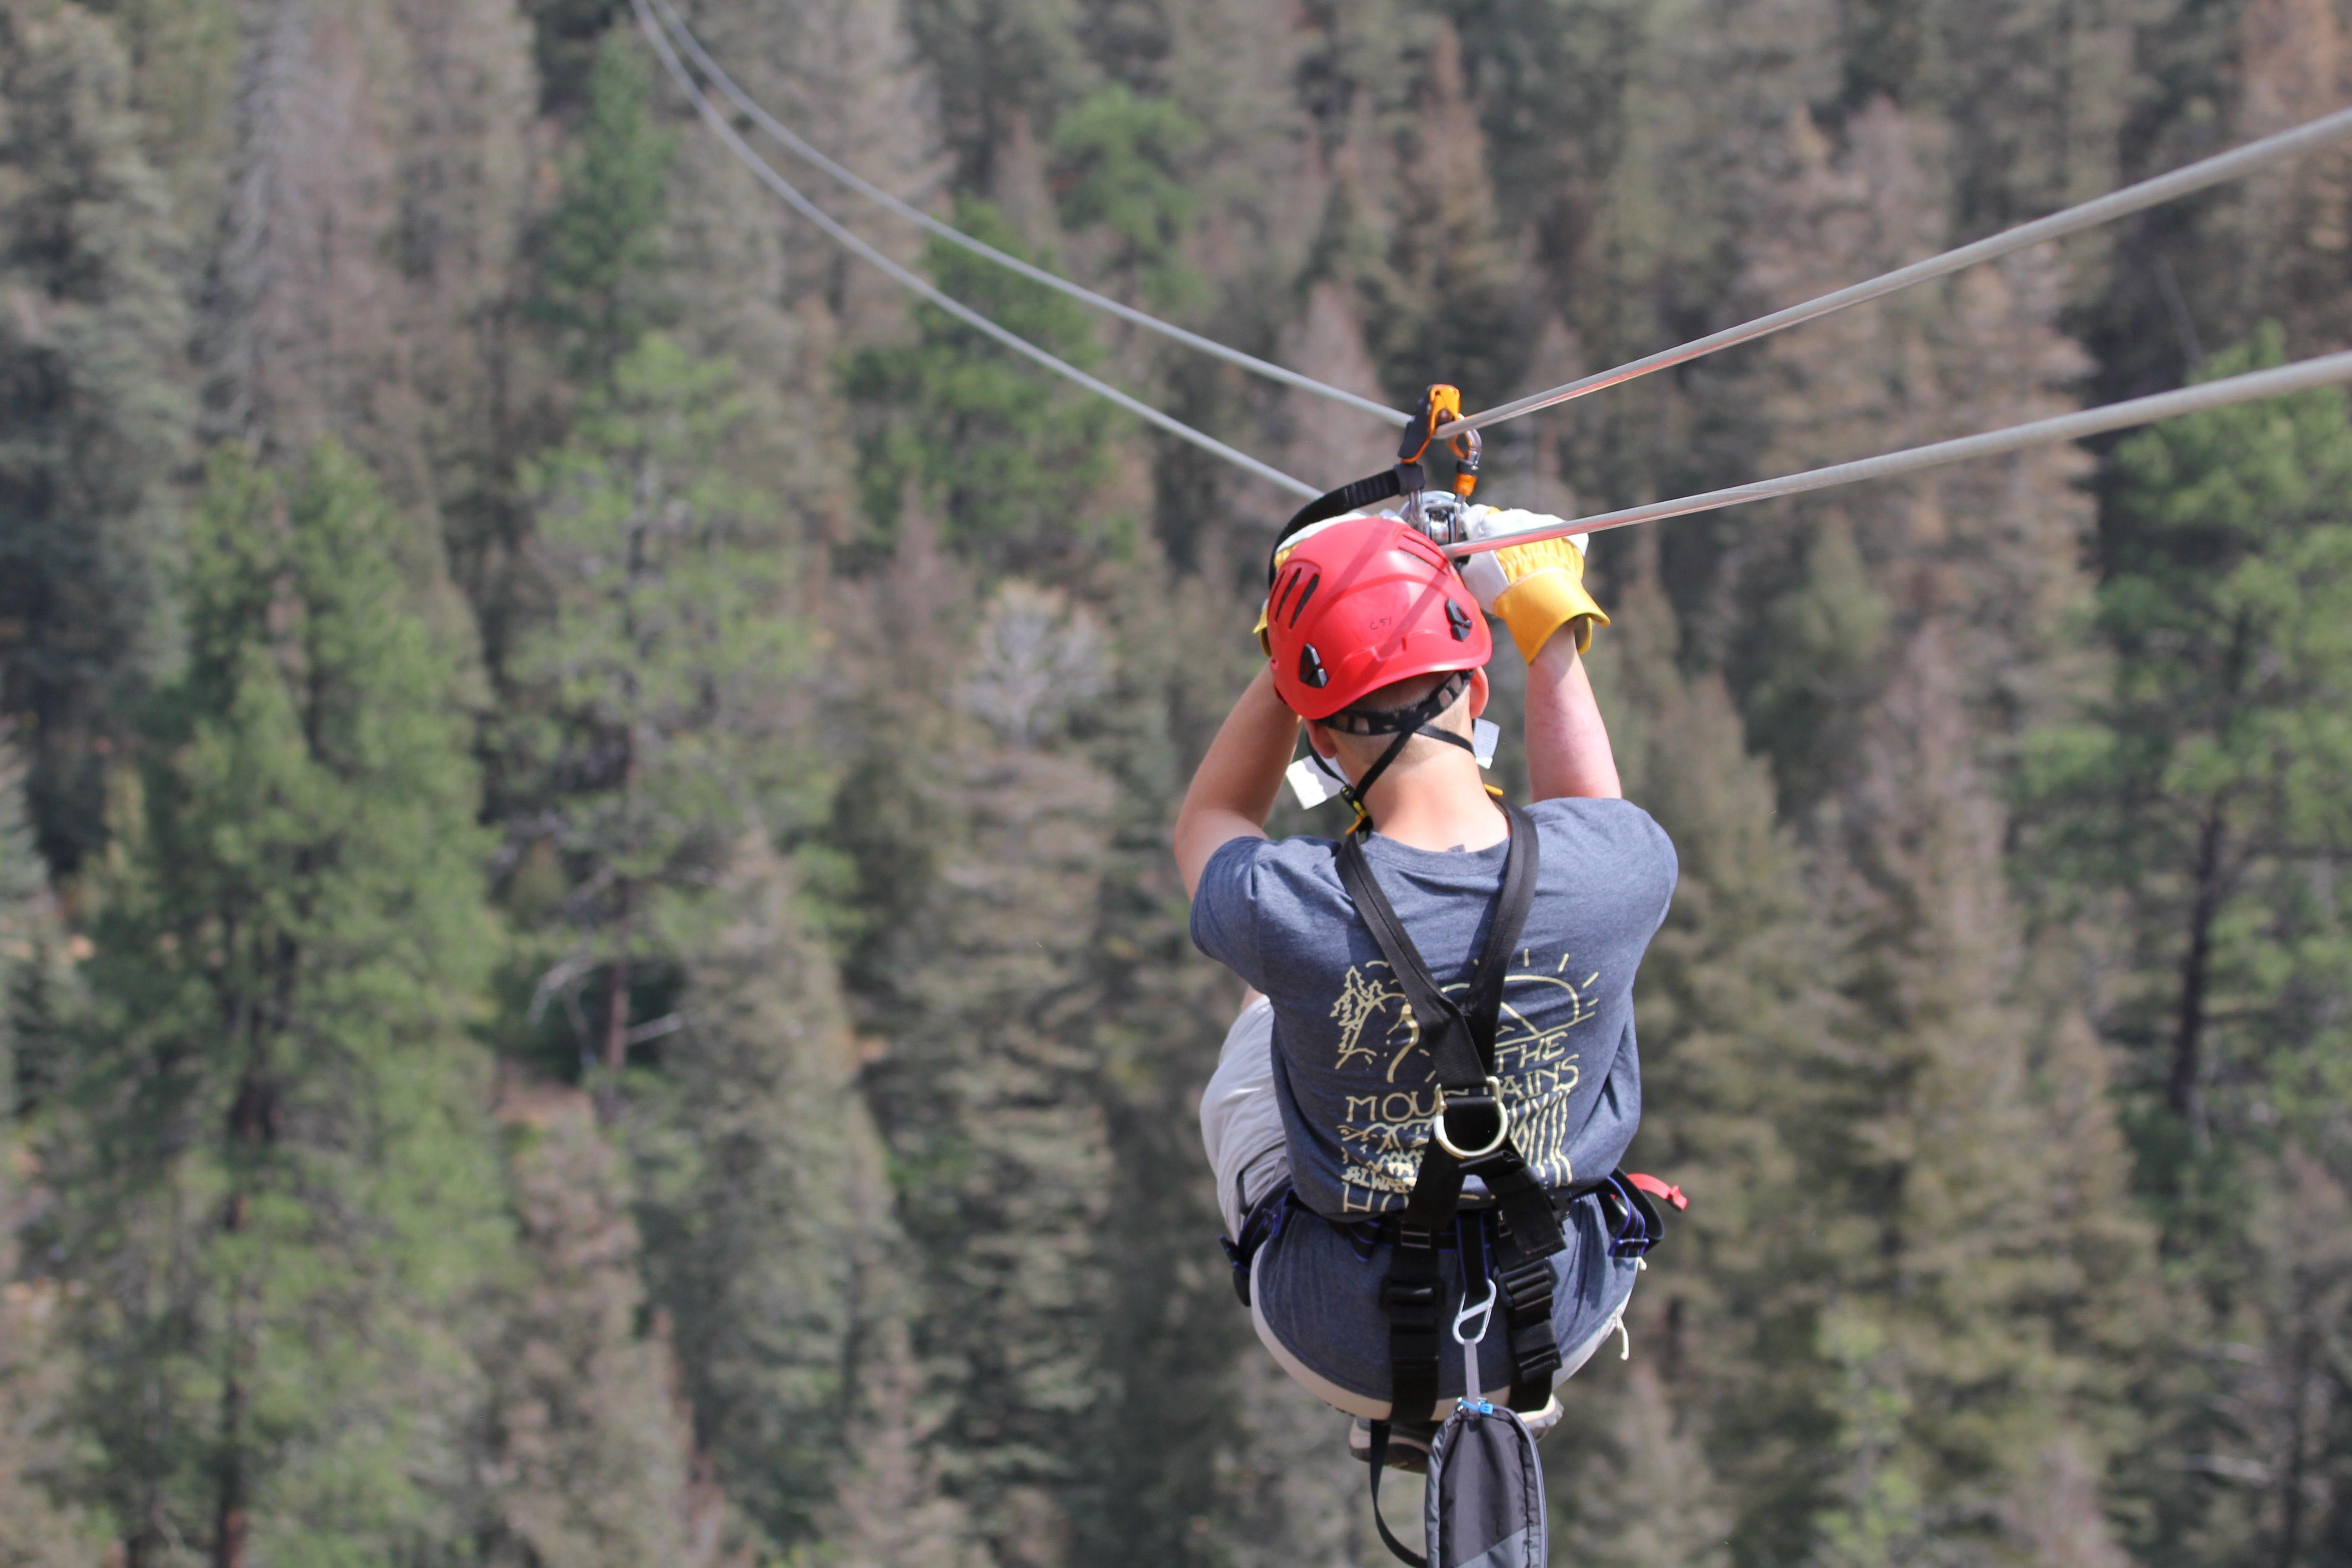 1 500 Ft Zipline Over Hiking Trails In The Seven Falls Park Incredible Thrill Zipline Soaring Waterfalls Coloradospring Ziplining Seven Falls Autumn Park